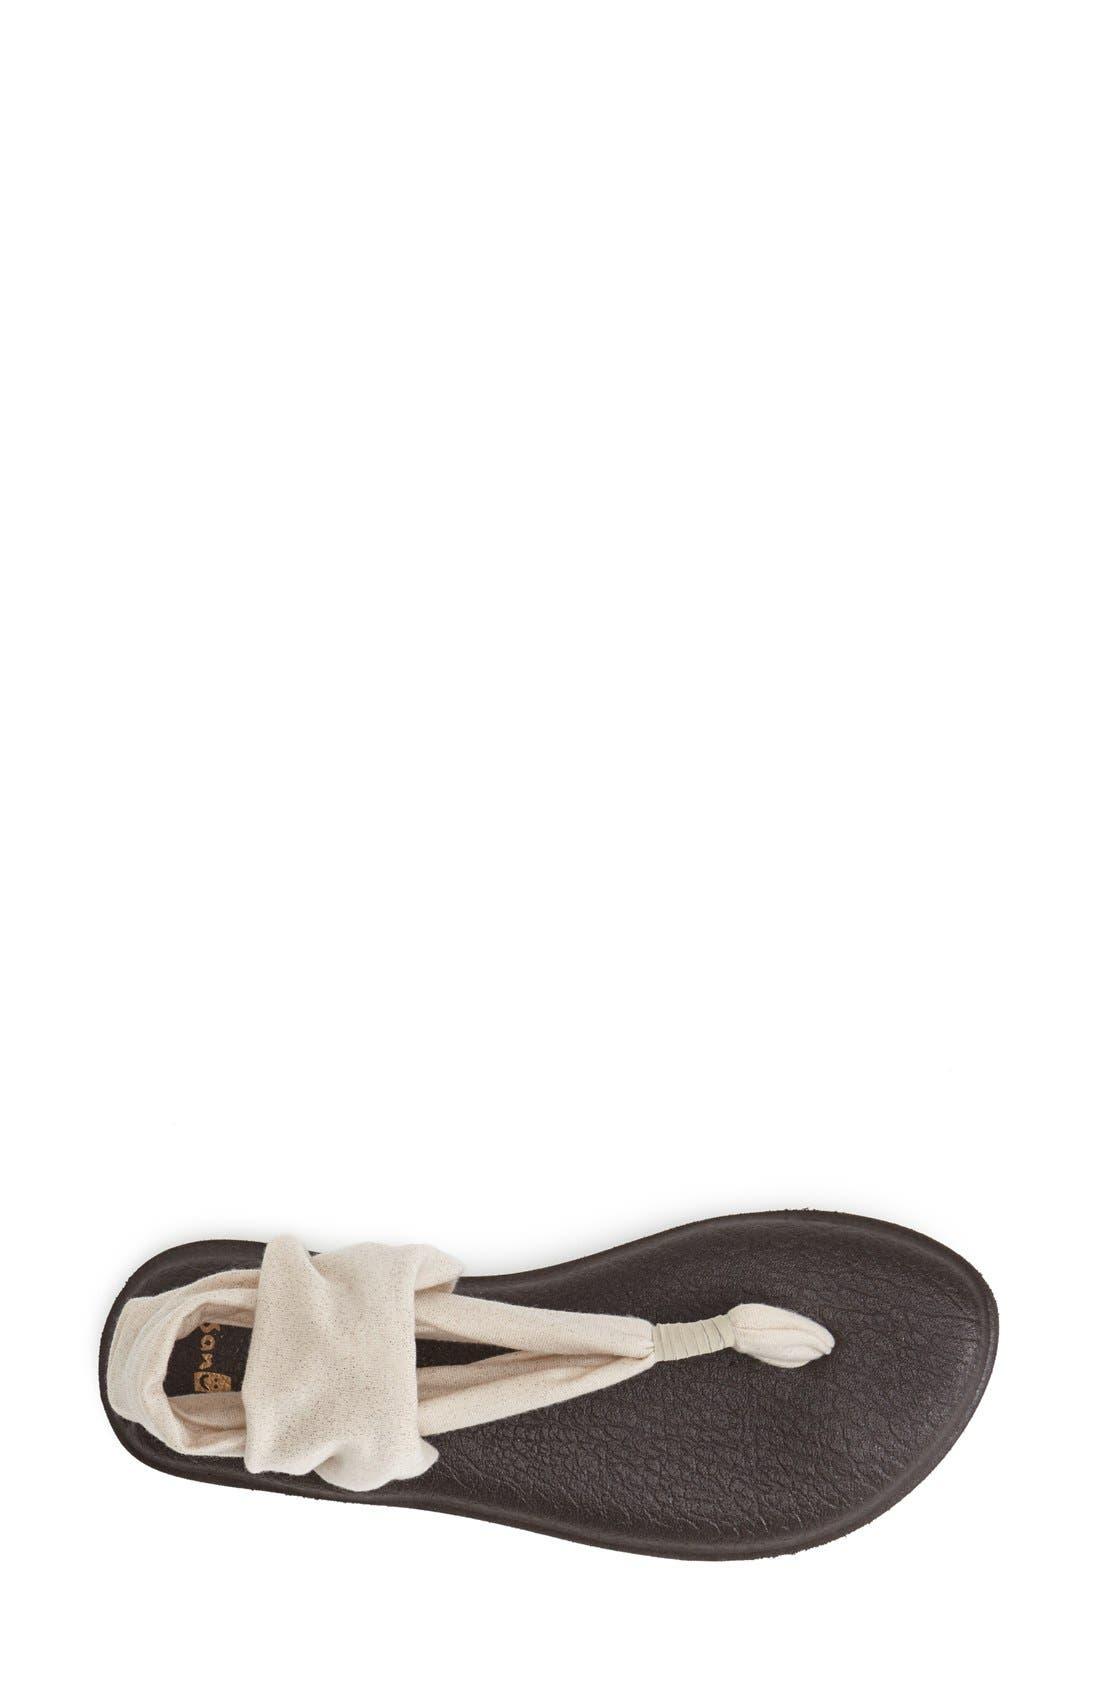 Alternate Image 3  - Sanuk 'Yoga Metallic Sling' Sandal (Women)